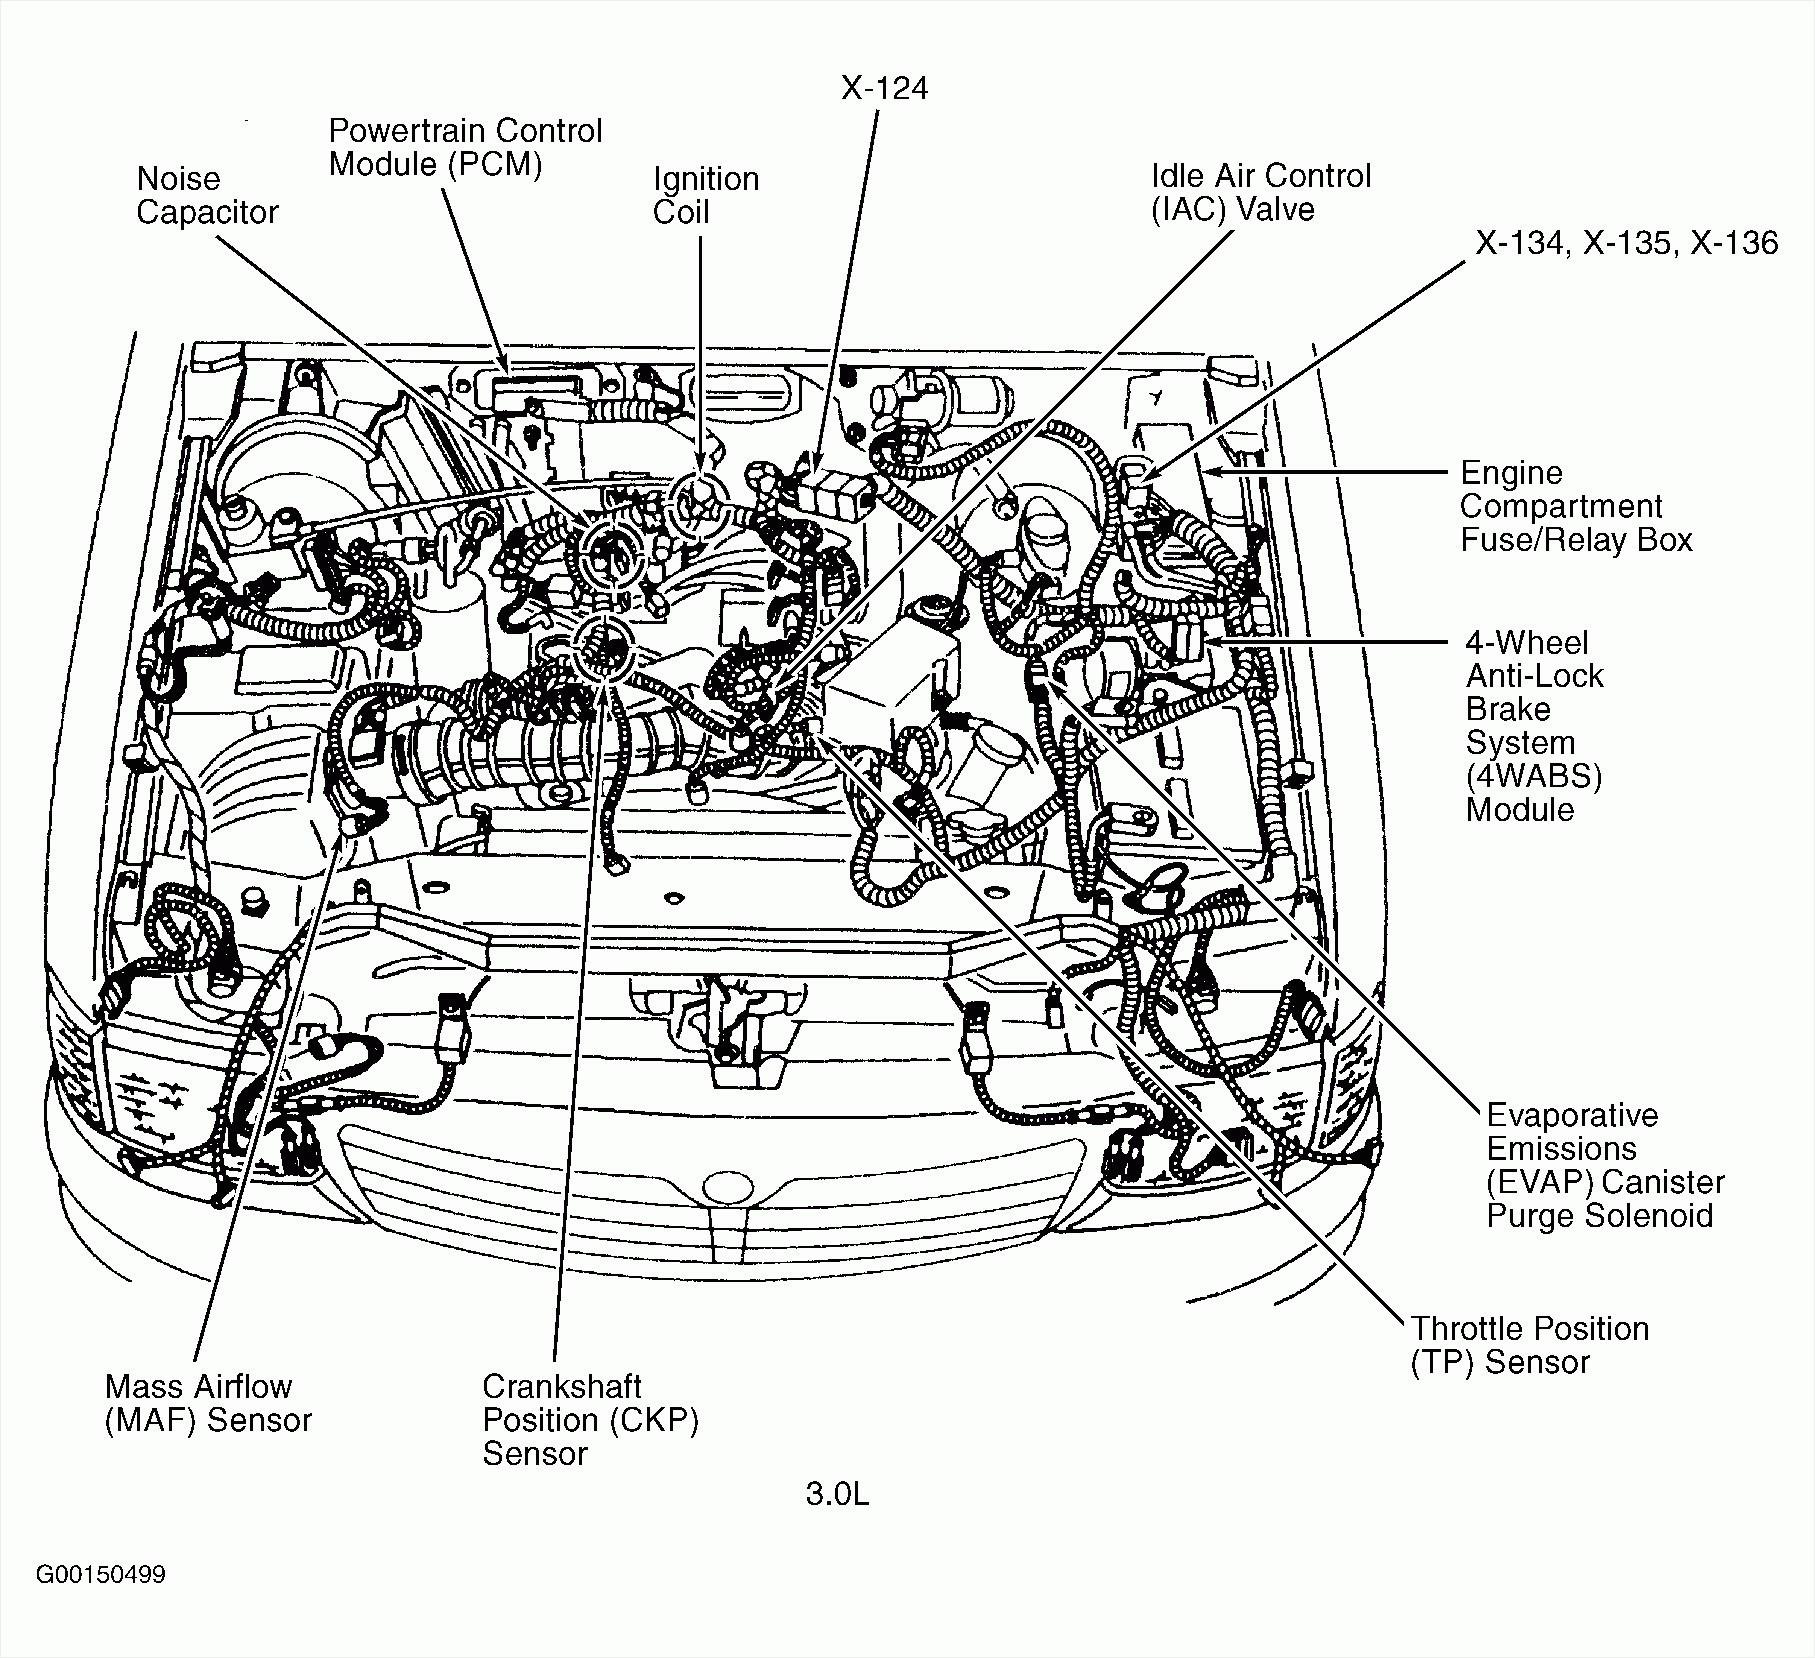 2001 ford Escape Engine Diagram ford Escape 3 0 Engine Diagram Of 2001 ford Escape Engine Diagram